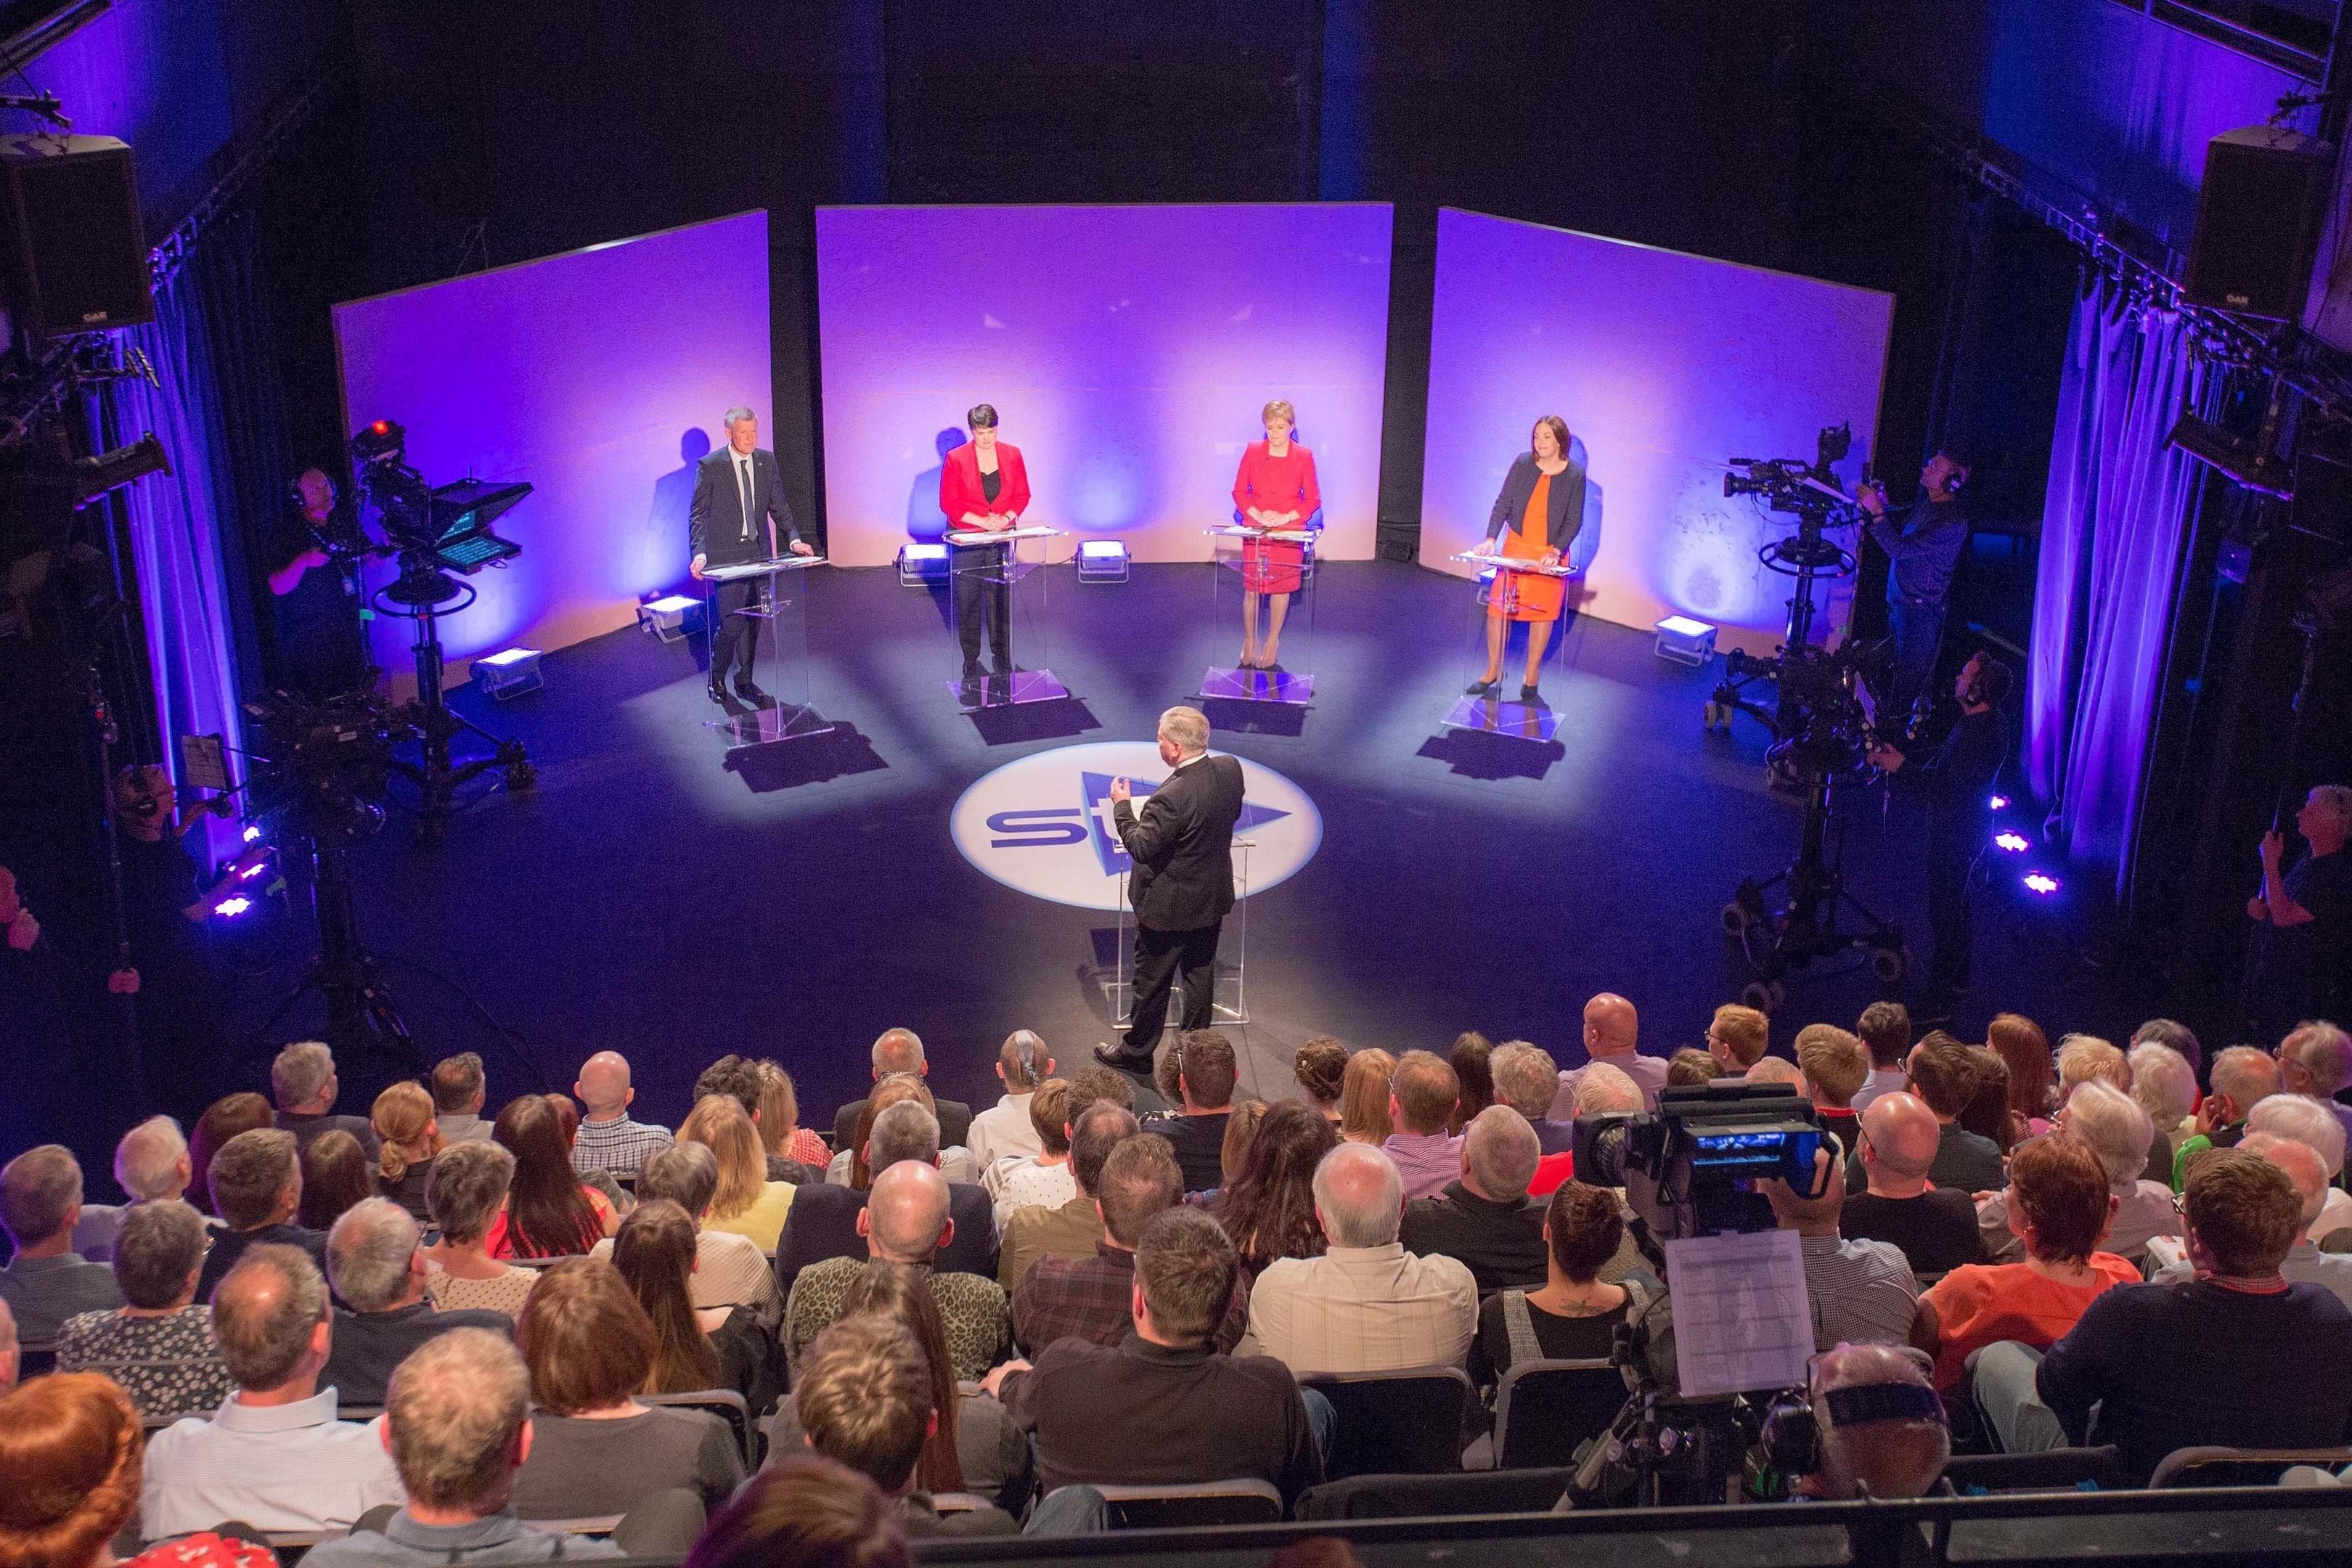 STV's political editor Bernard Ponsonby presenting an STV debate with, from left, Scottish Liberal Democrat leader Willie Rennie, Scottish Conservative leader Ruth Davidson, SNP leader Nicola Sturgeon and Scottish Labour leader Kezia Dugdale.